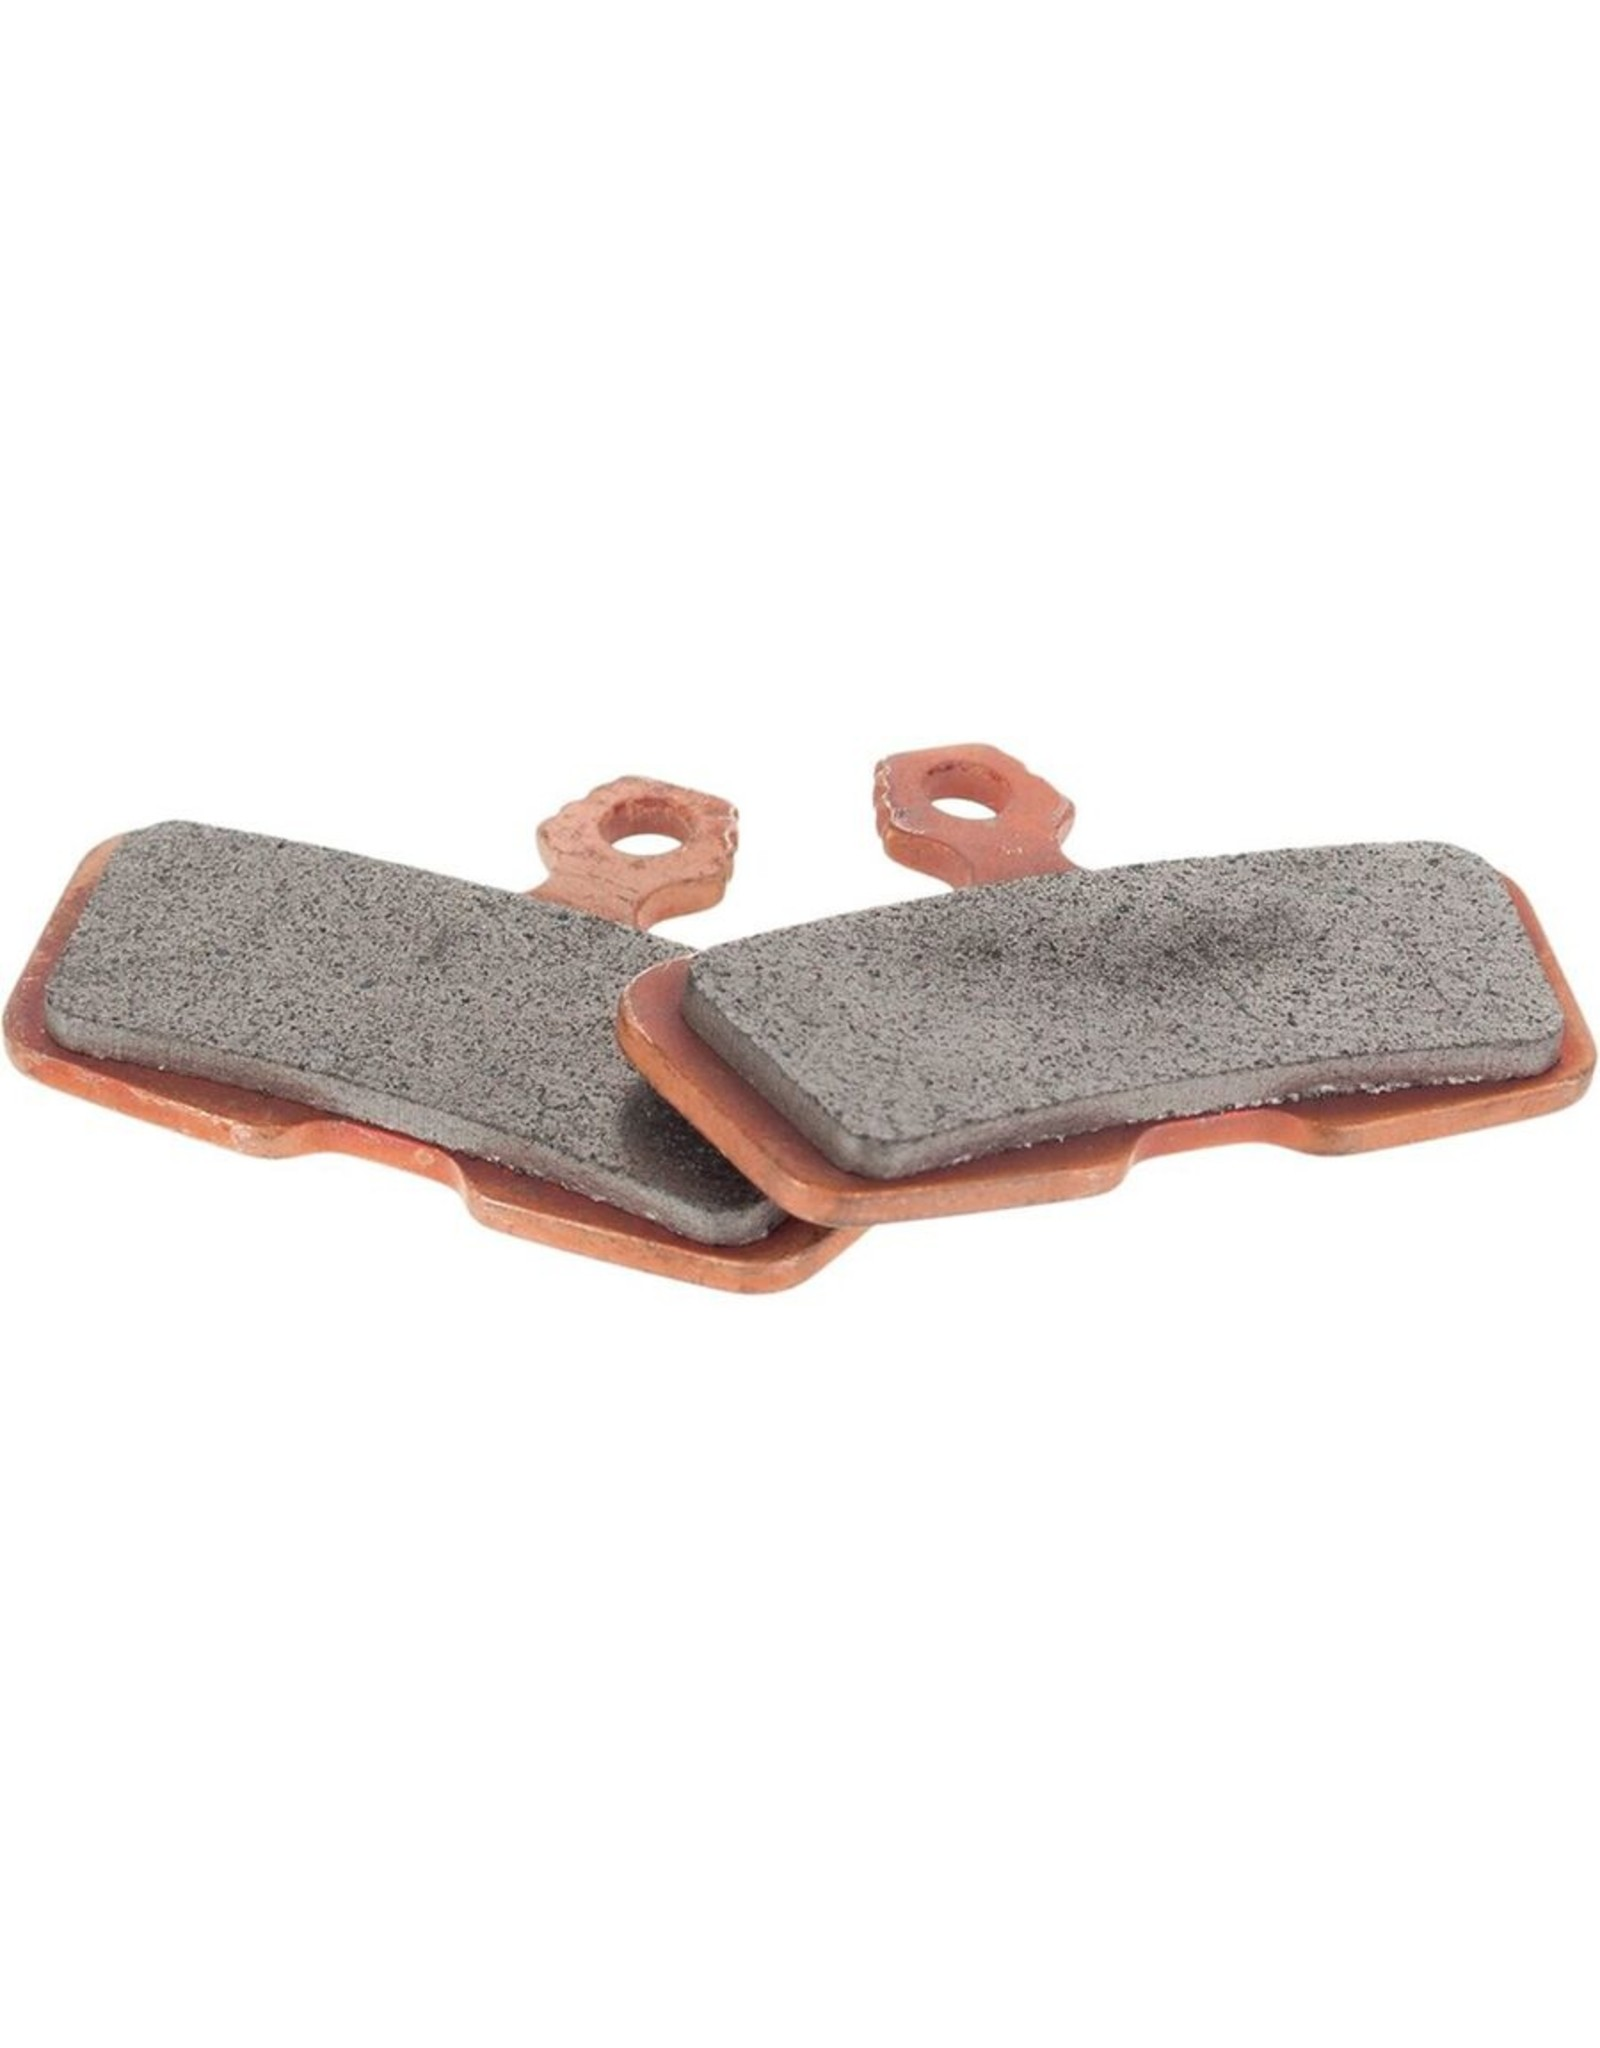 SRAM Disc Pads, 11+ Code 4-Piston - Organic/Steel (Pair)